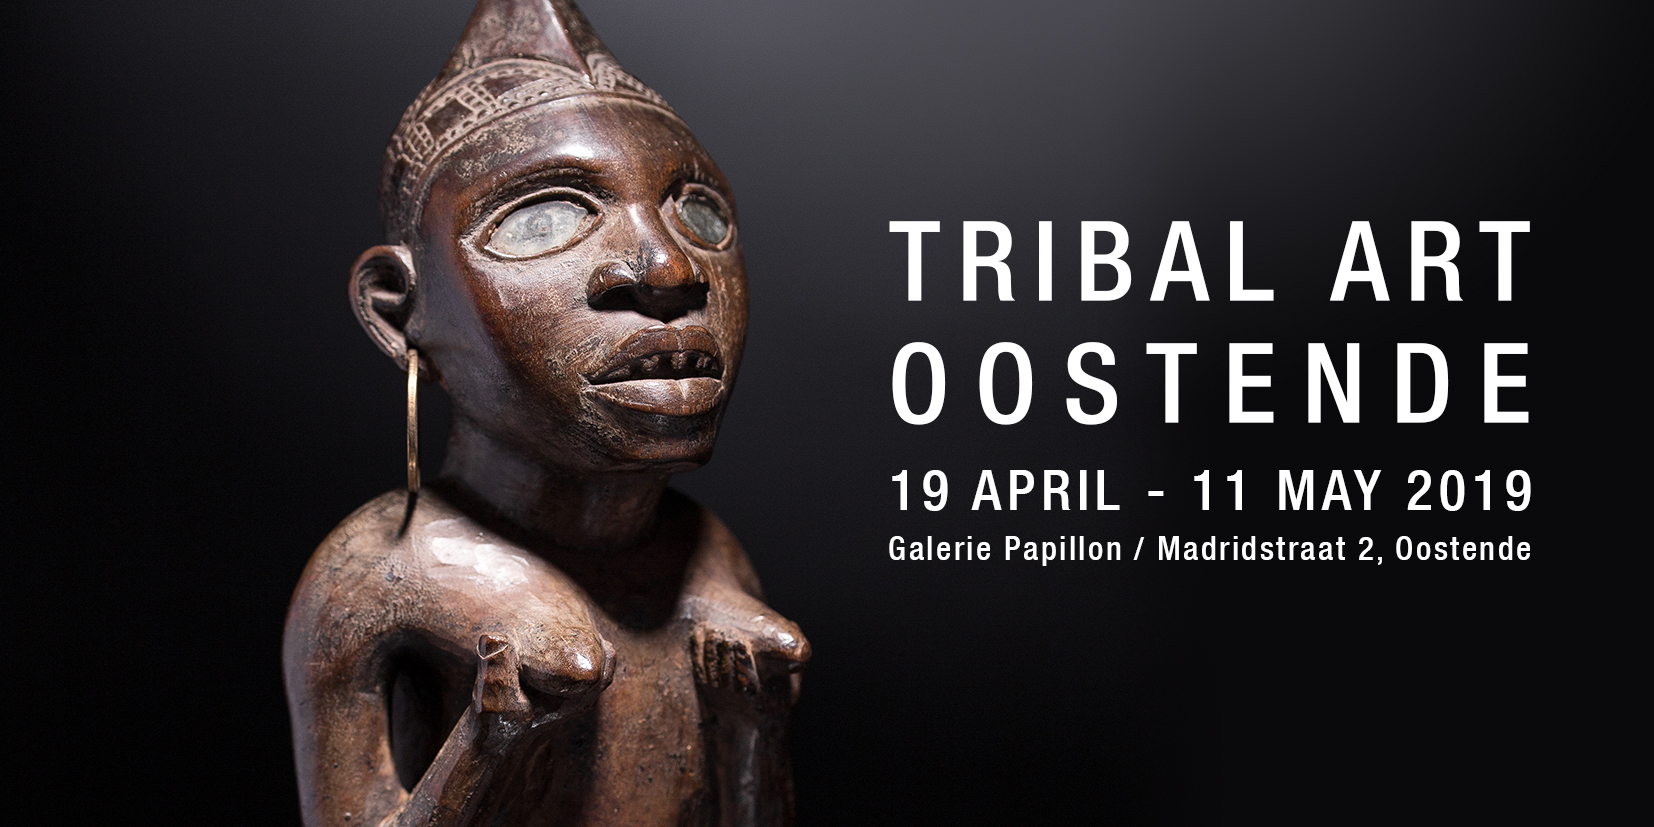 tribal-art-oostende-ostende-belgique-foire-exposition-galerie-art-africain-belgique-lz-arts.jpg